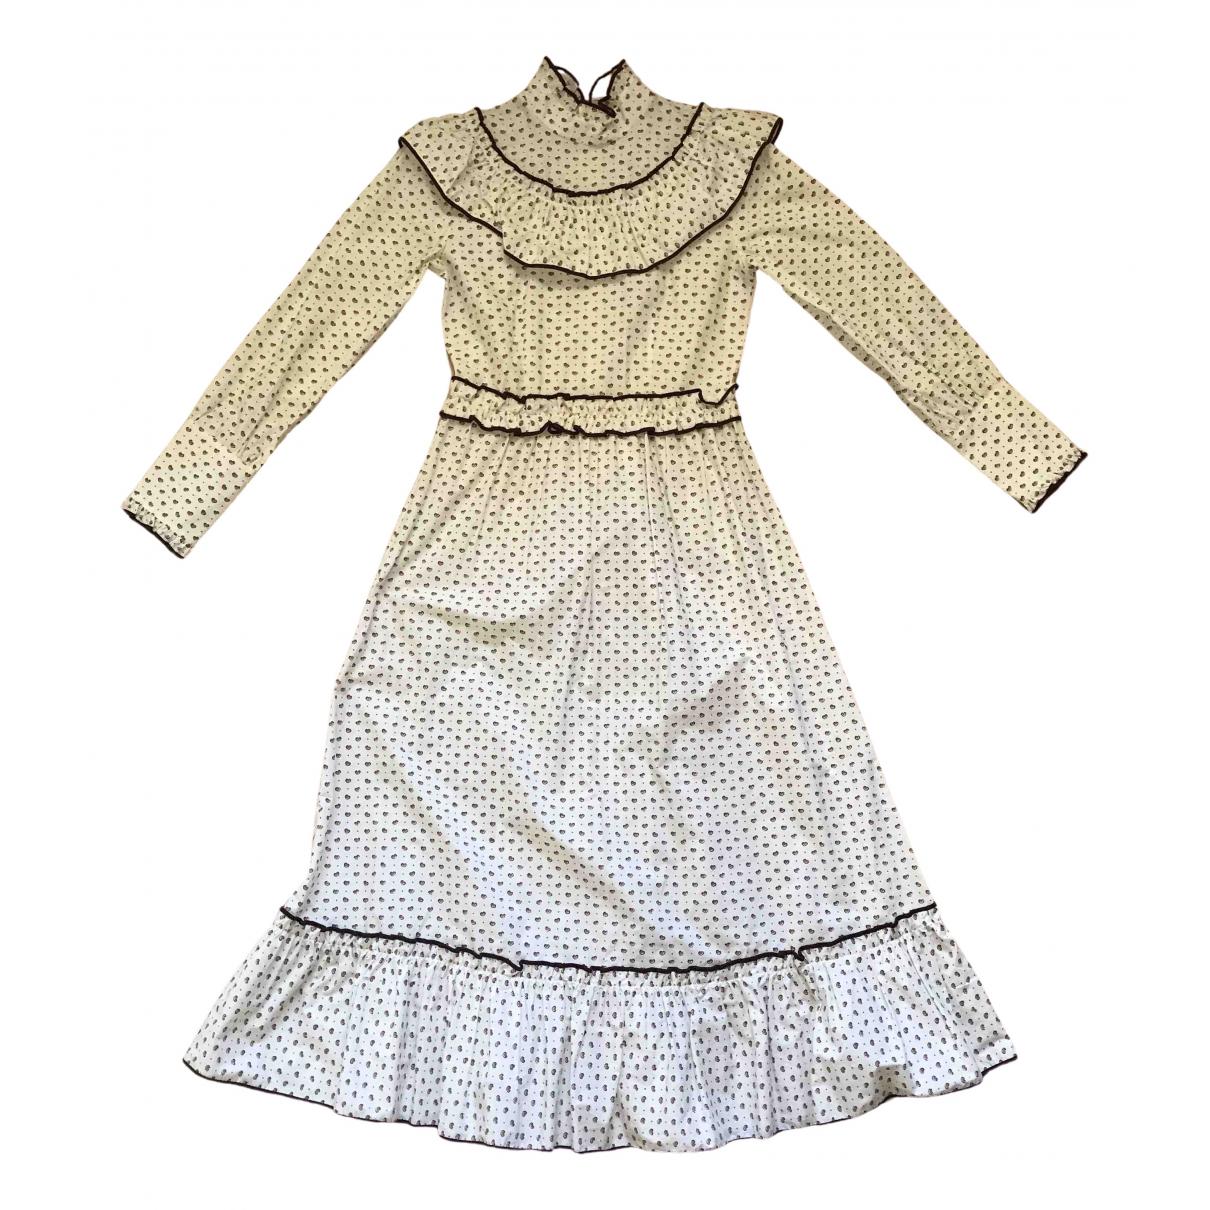 Ganni - Robe Spring Summer 2019 pour femme en coton - blanc